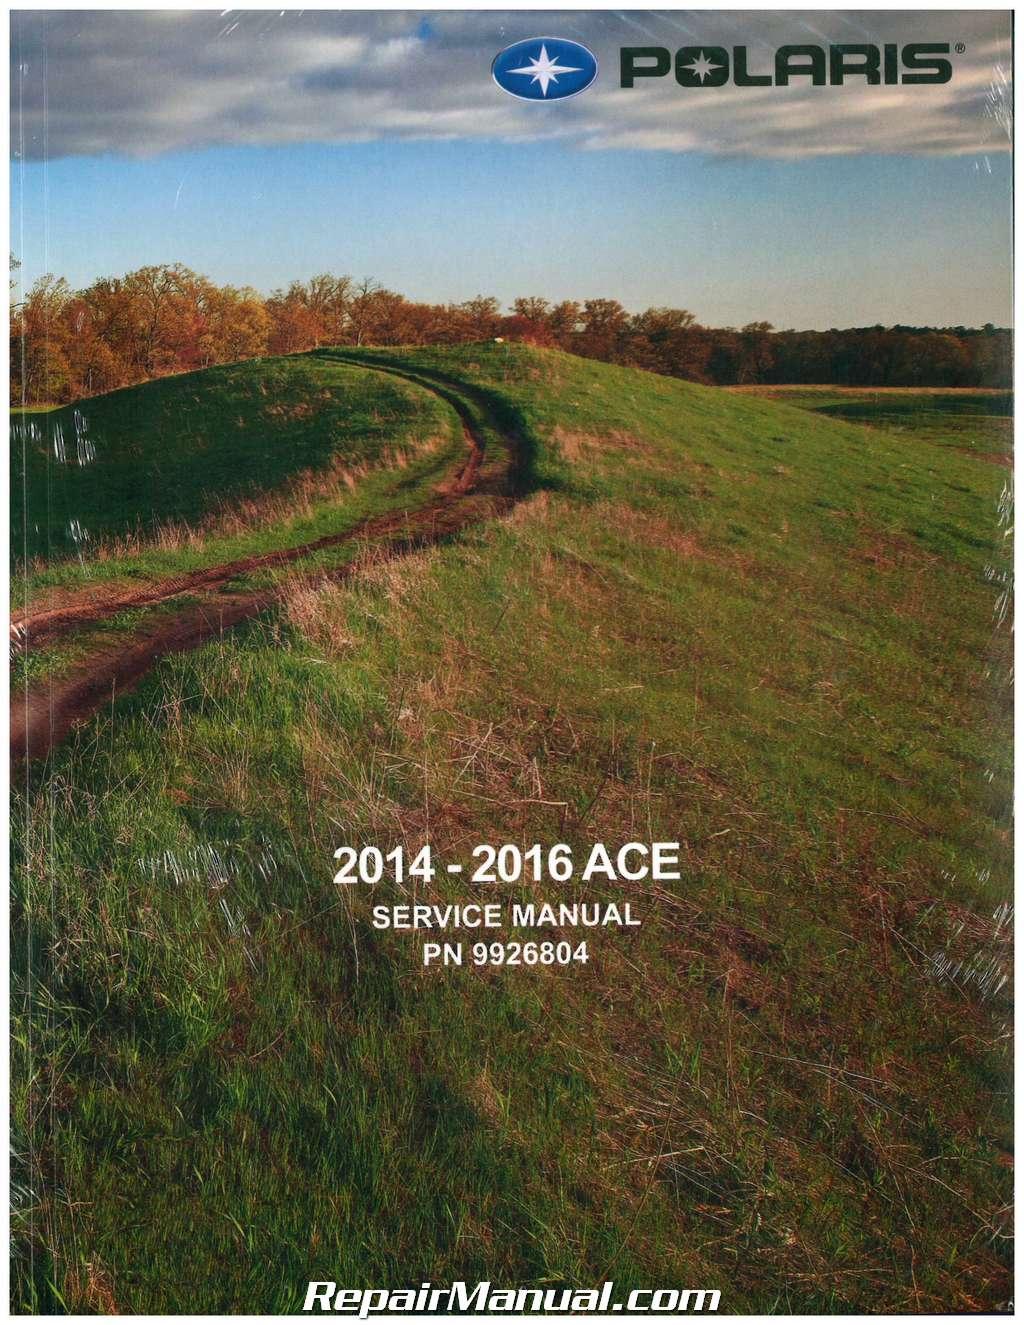 2014 2016 Polaris Sportsman Ace Paper Atv Service Manual Wiring Diagram